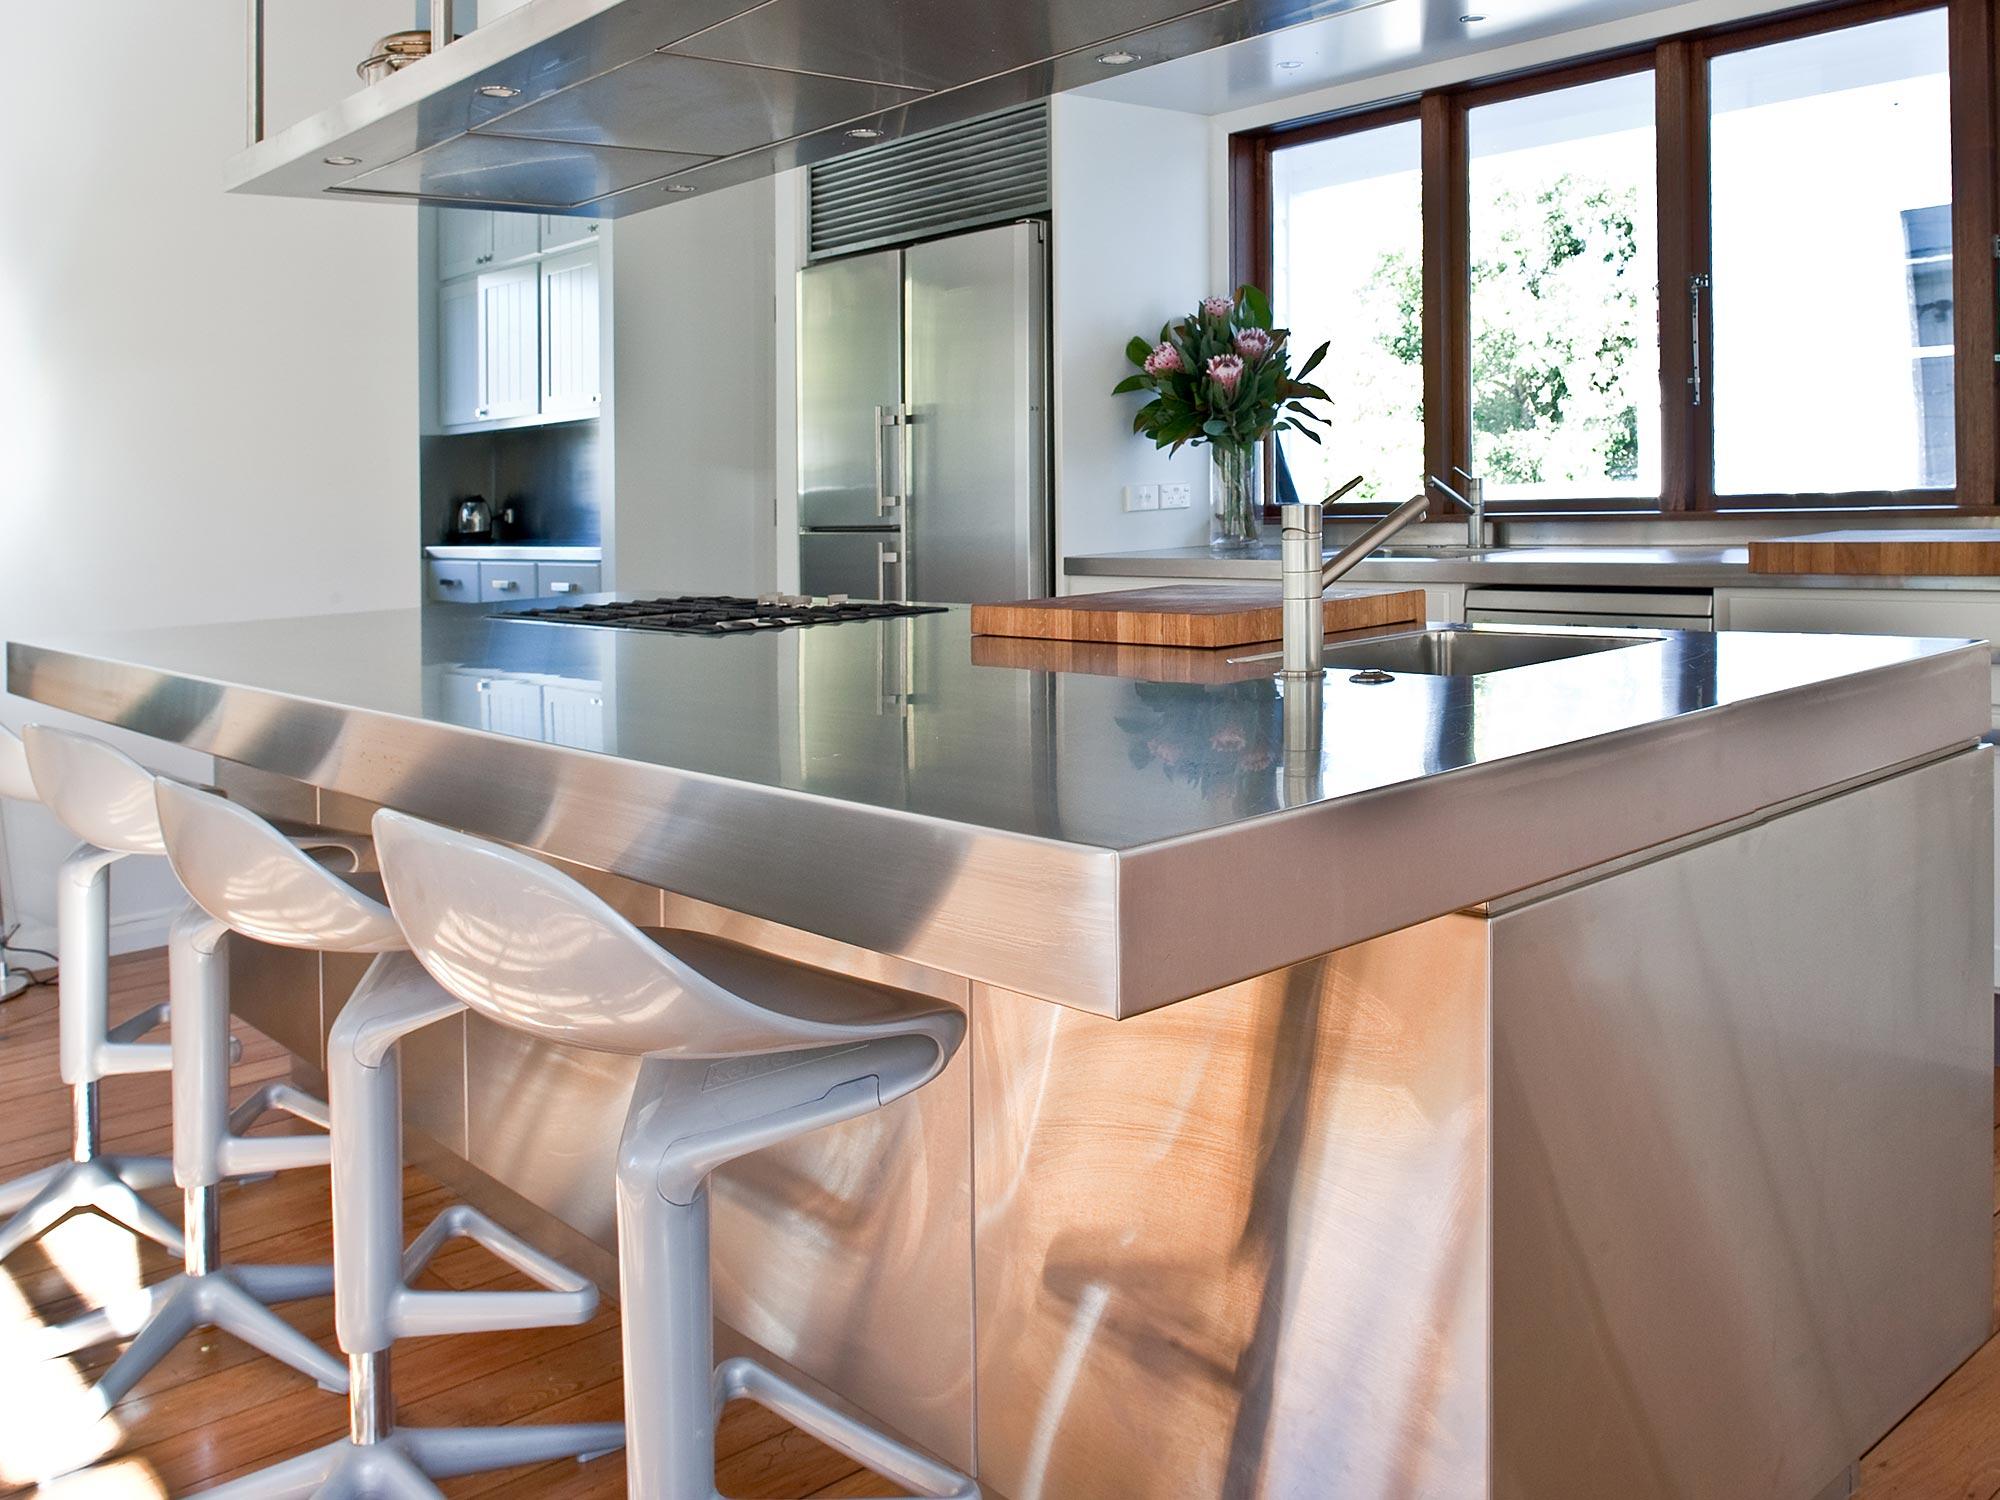 Stainless steel kitchen tops